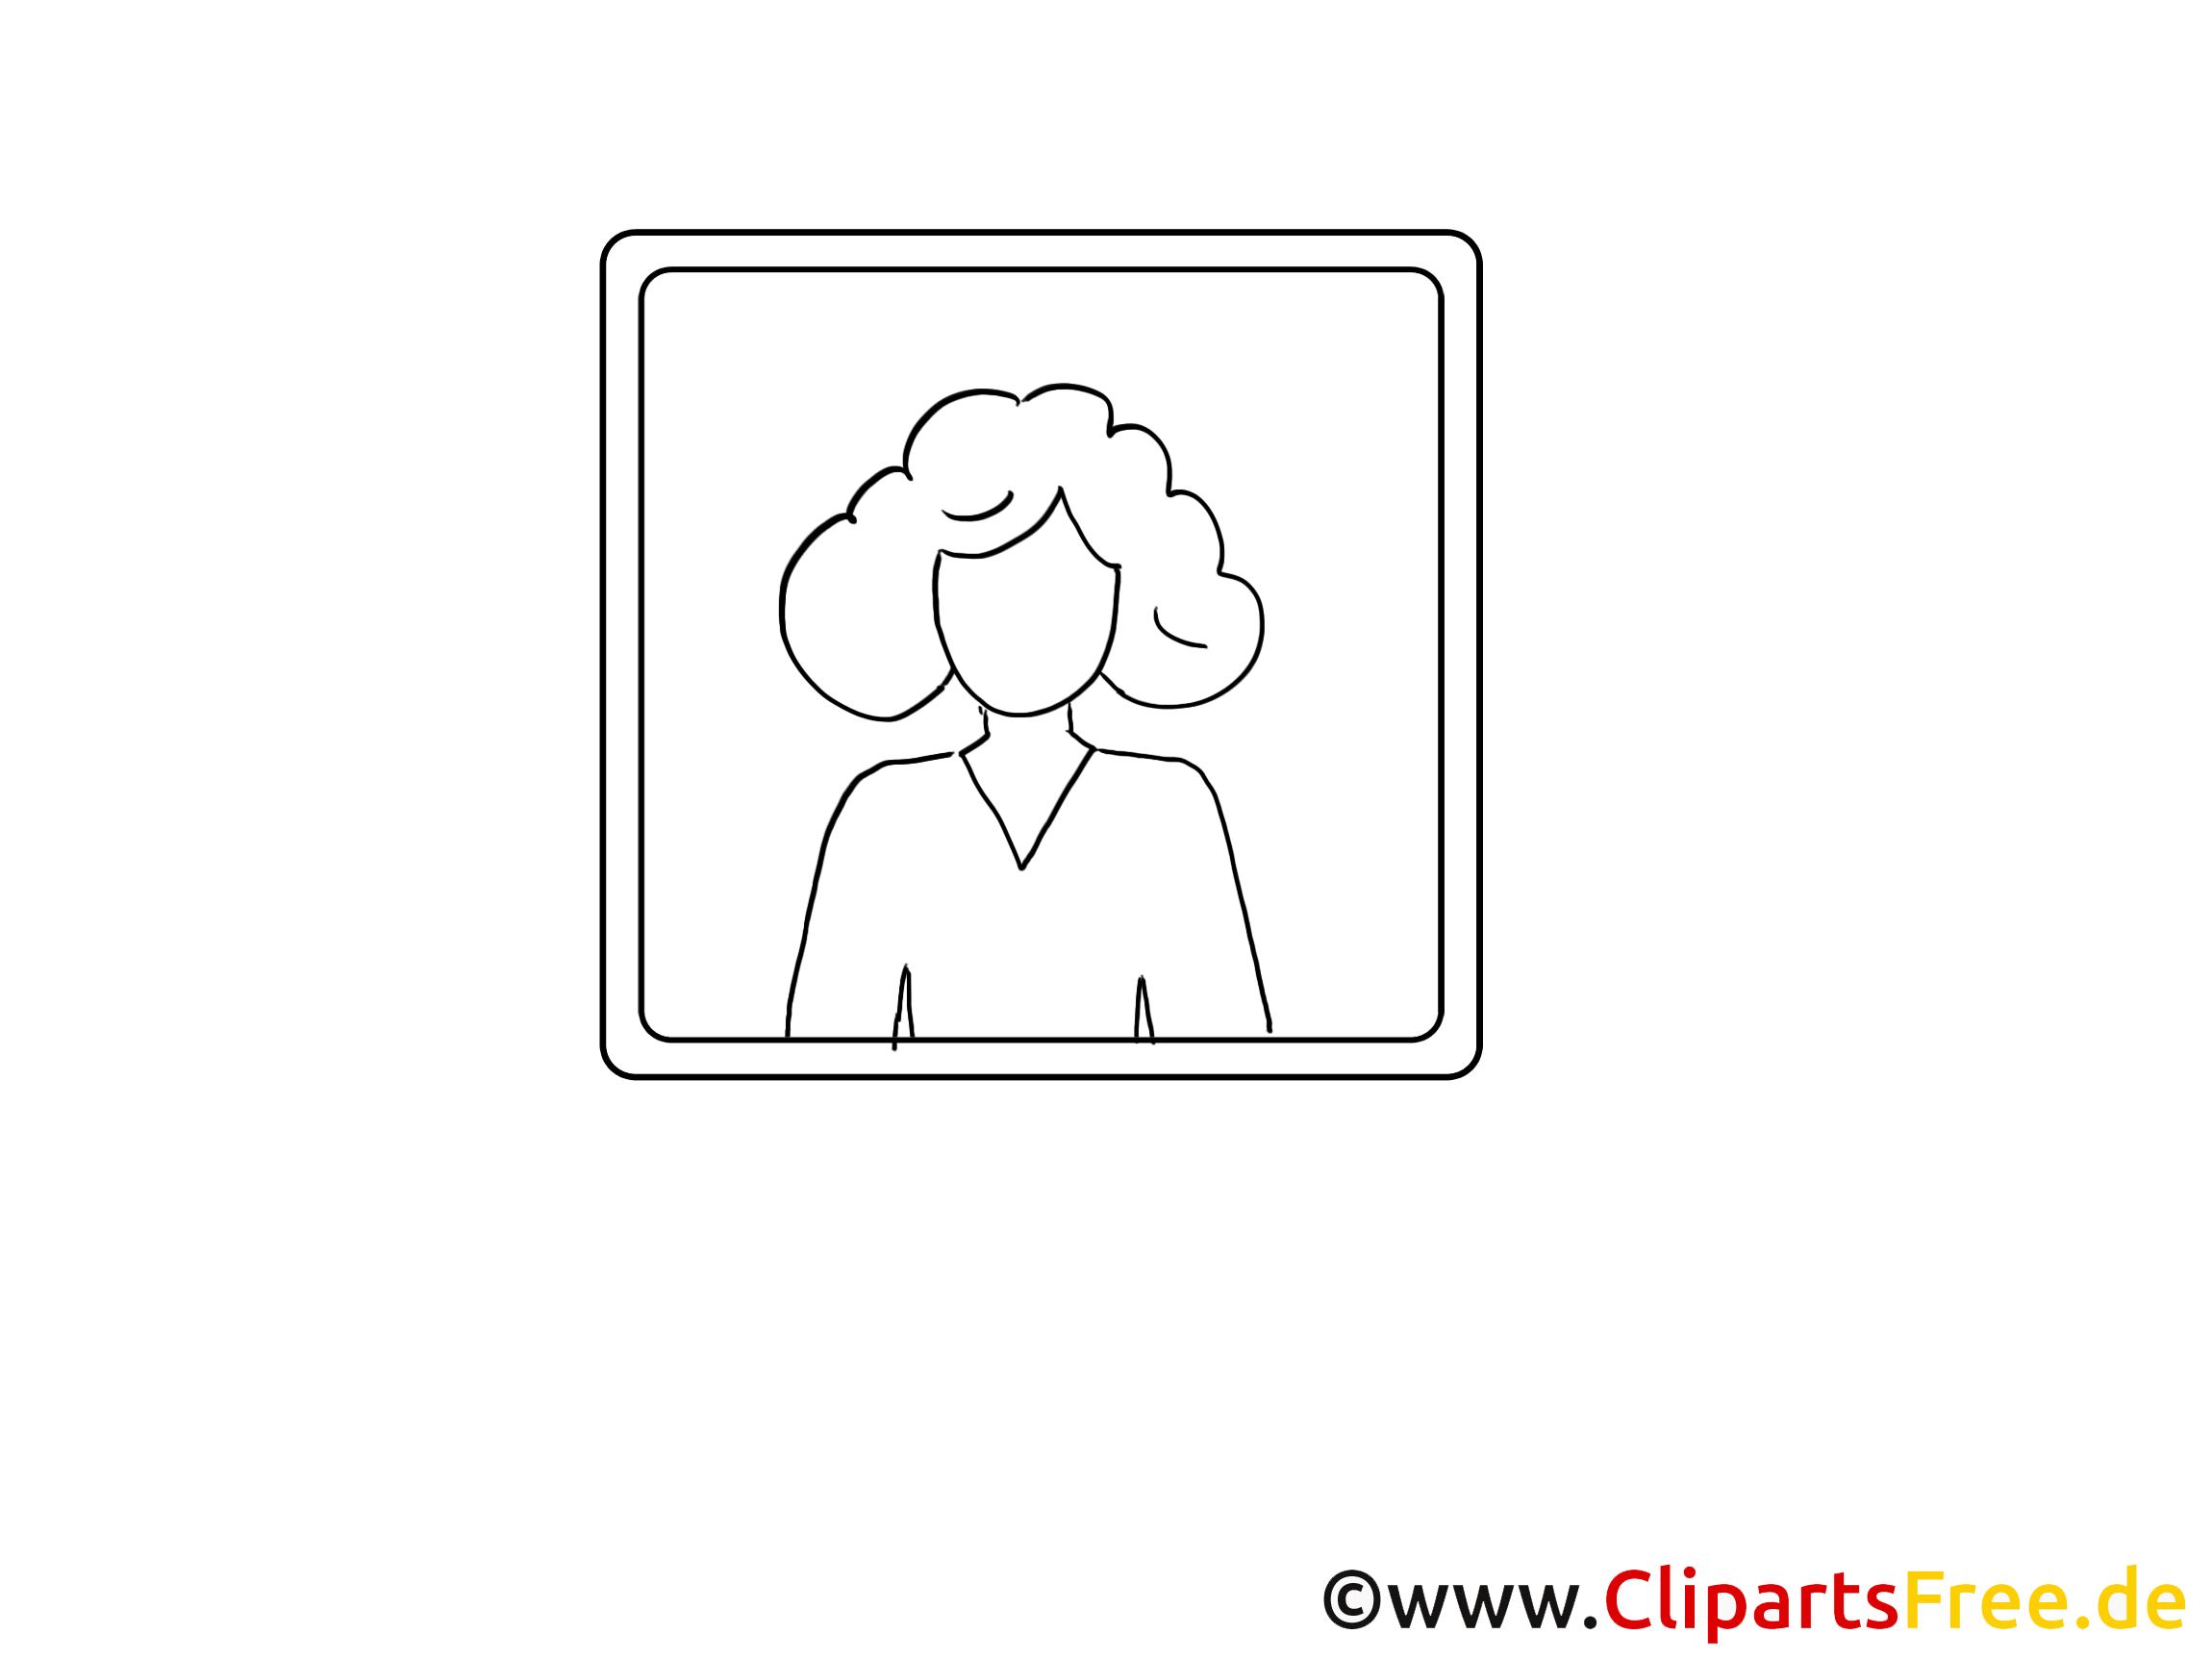 Image femme - Icône images cliparts